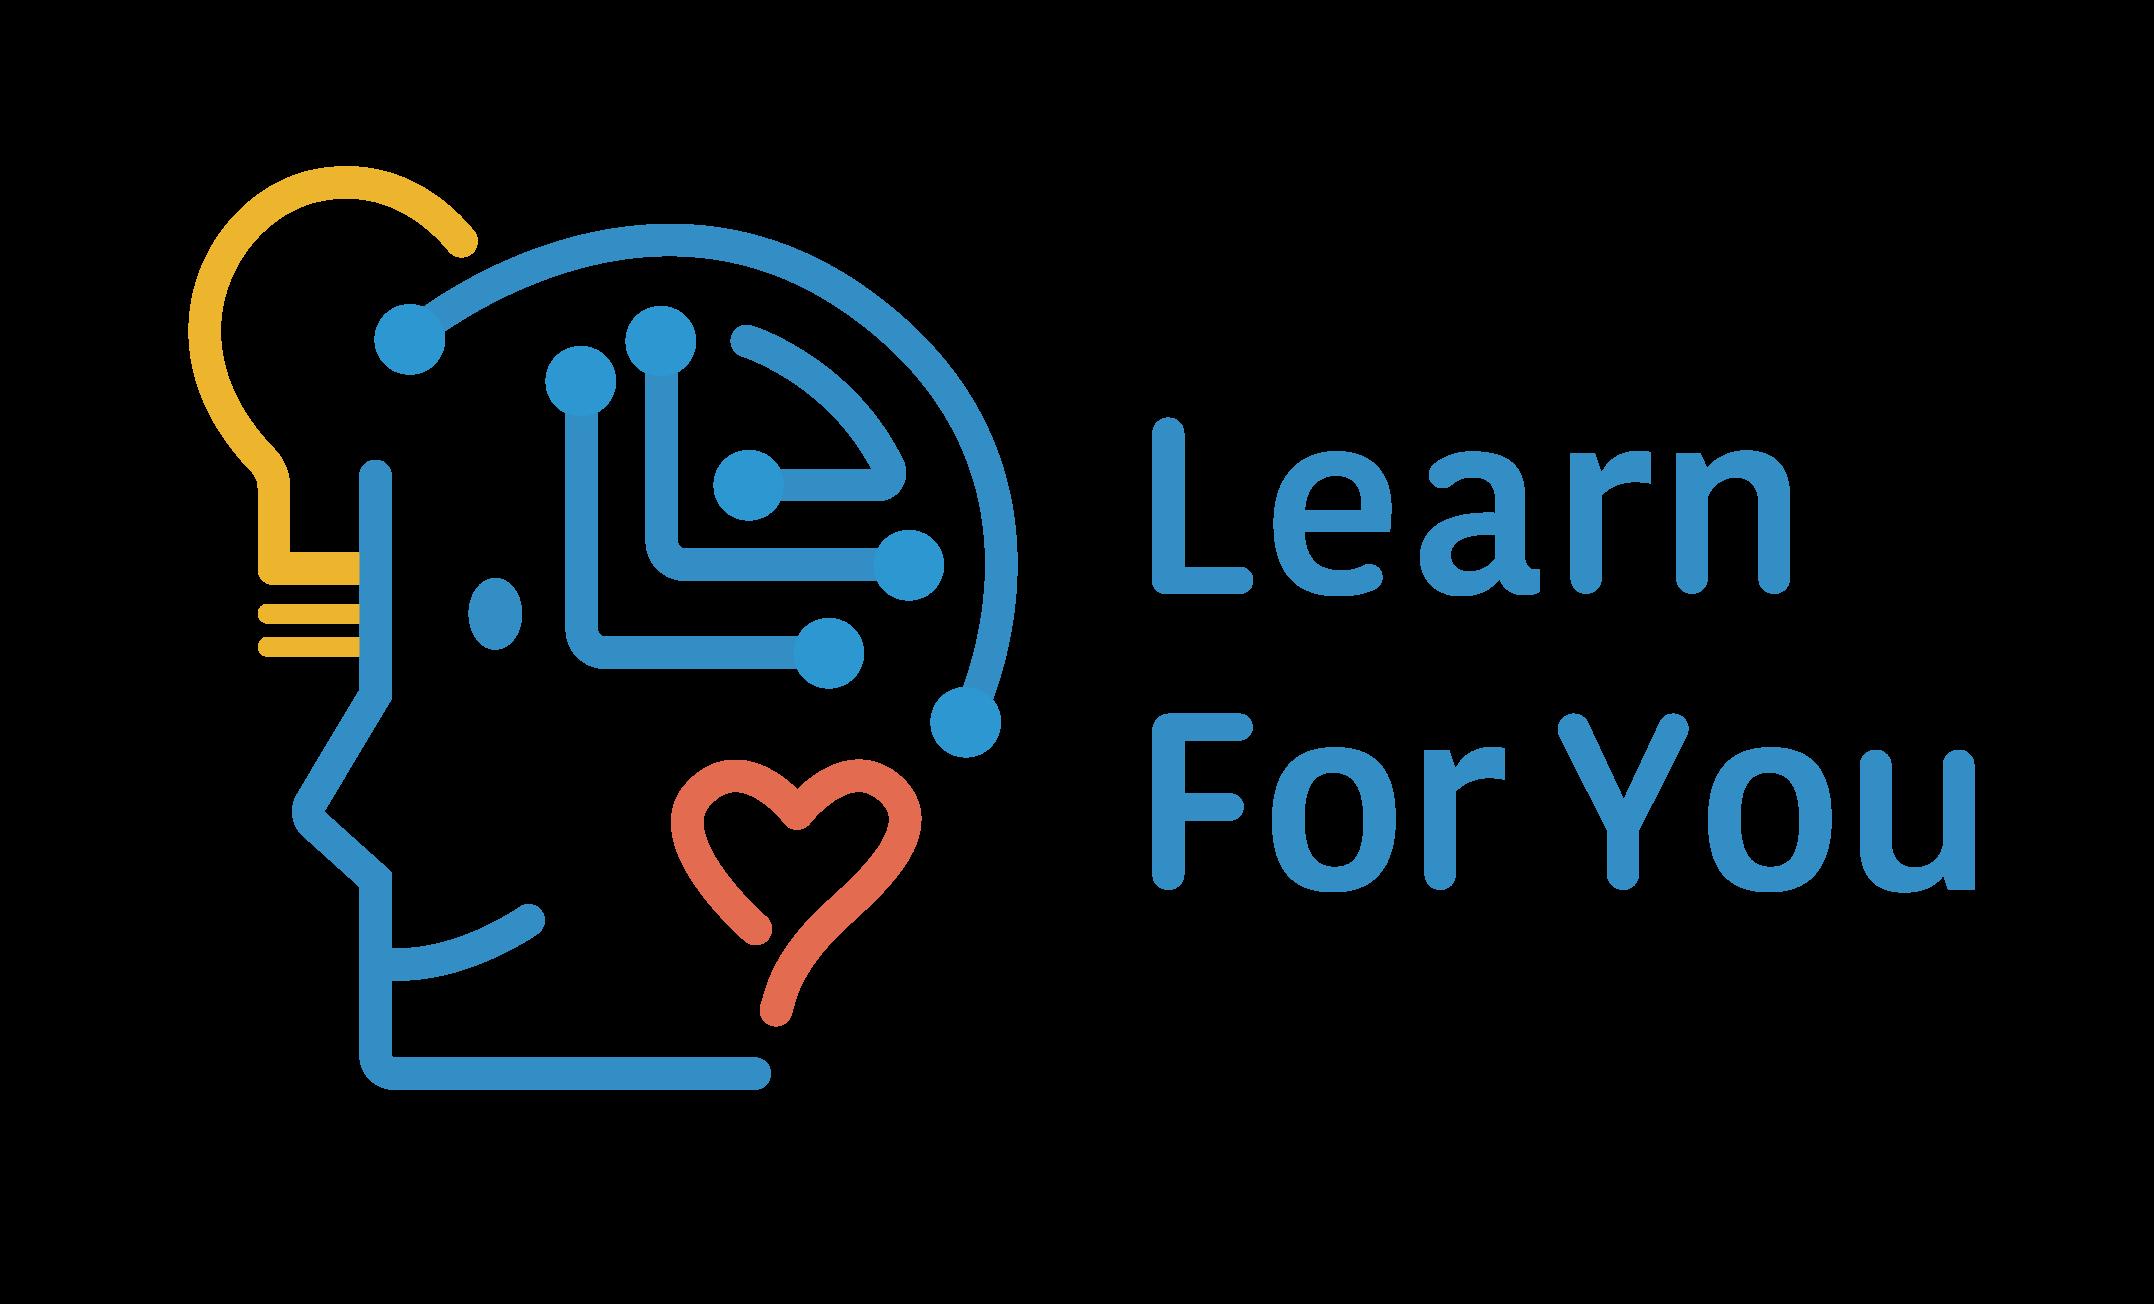 LearnForYou